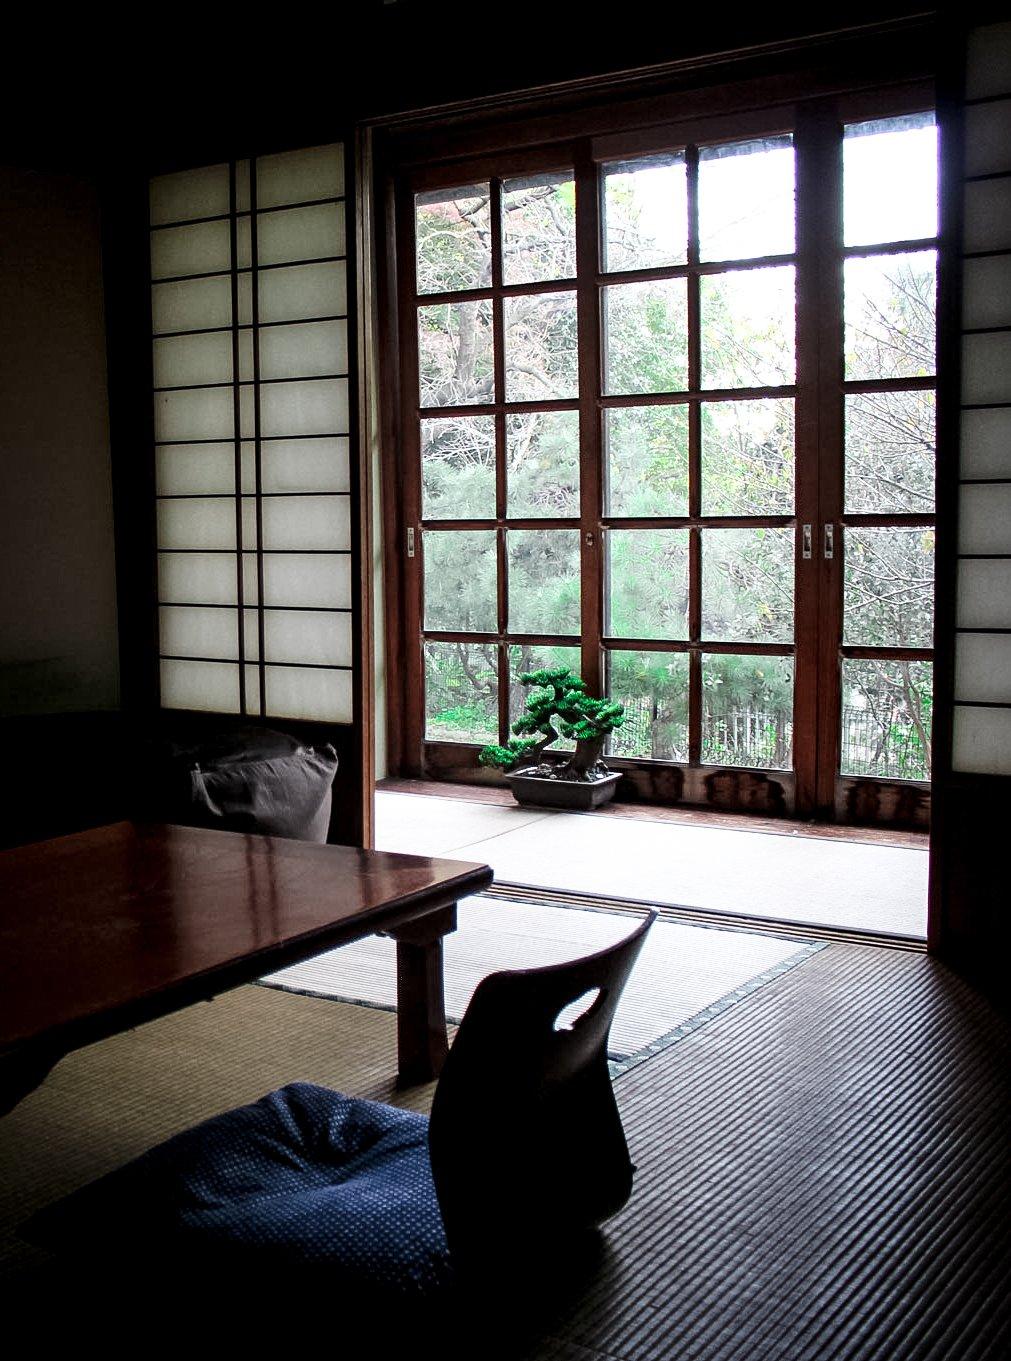 Tokyo | Conscious Travel Guide